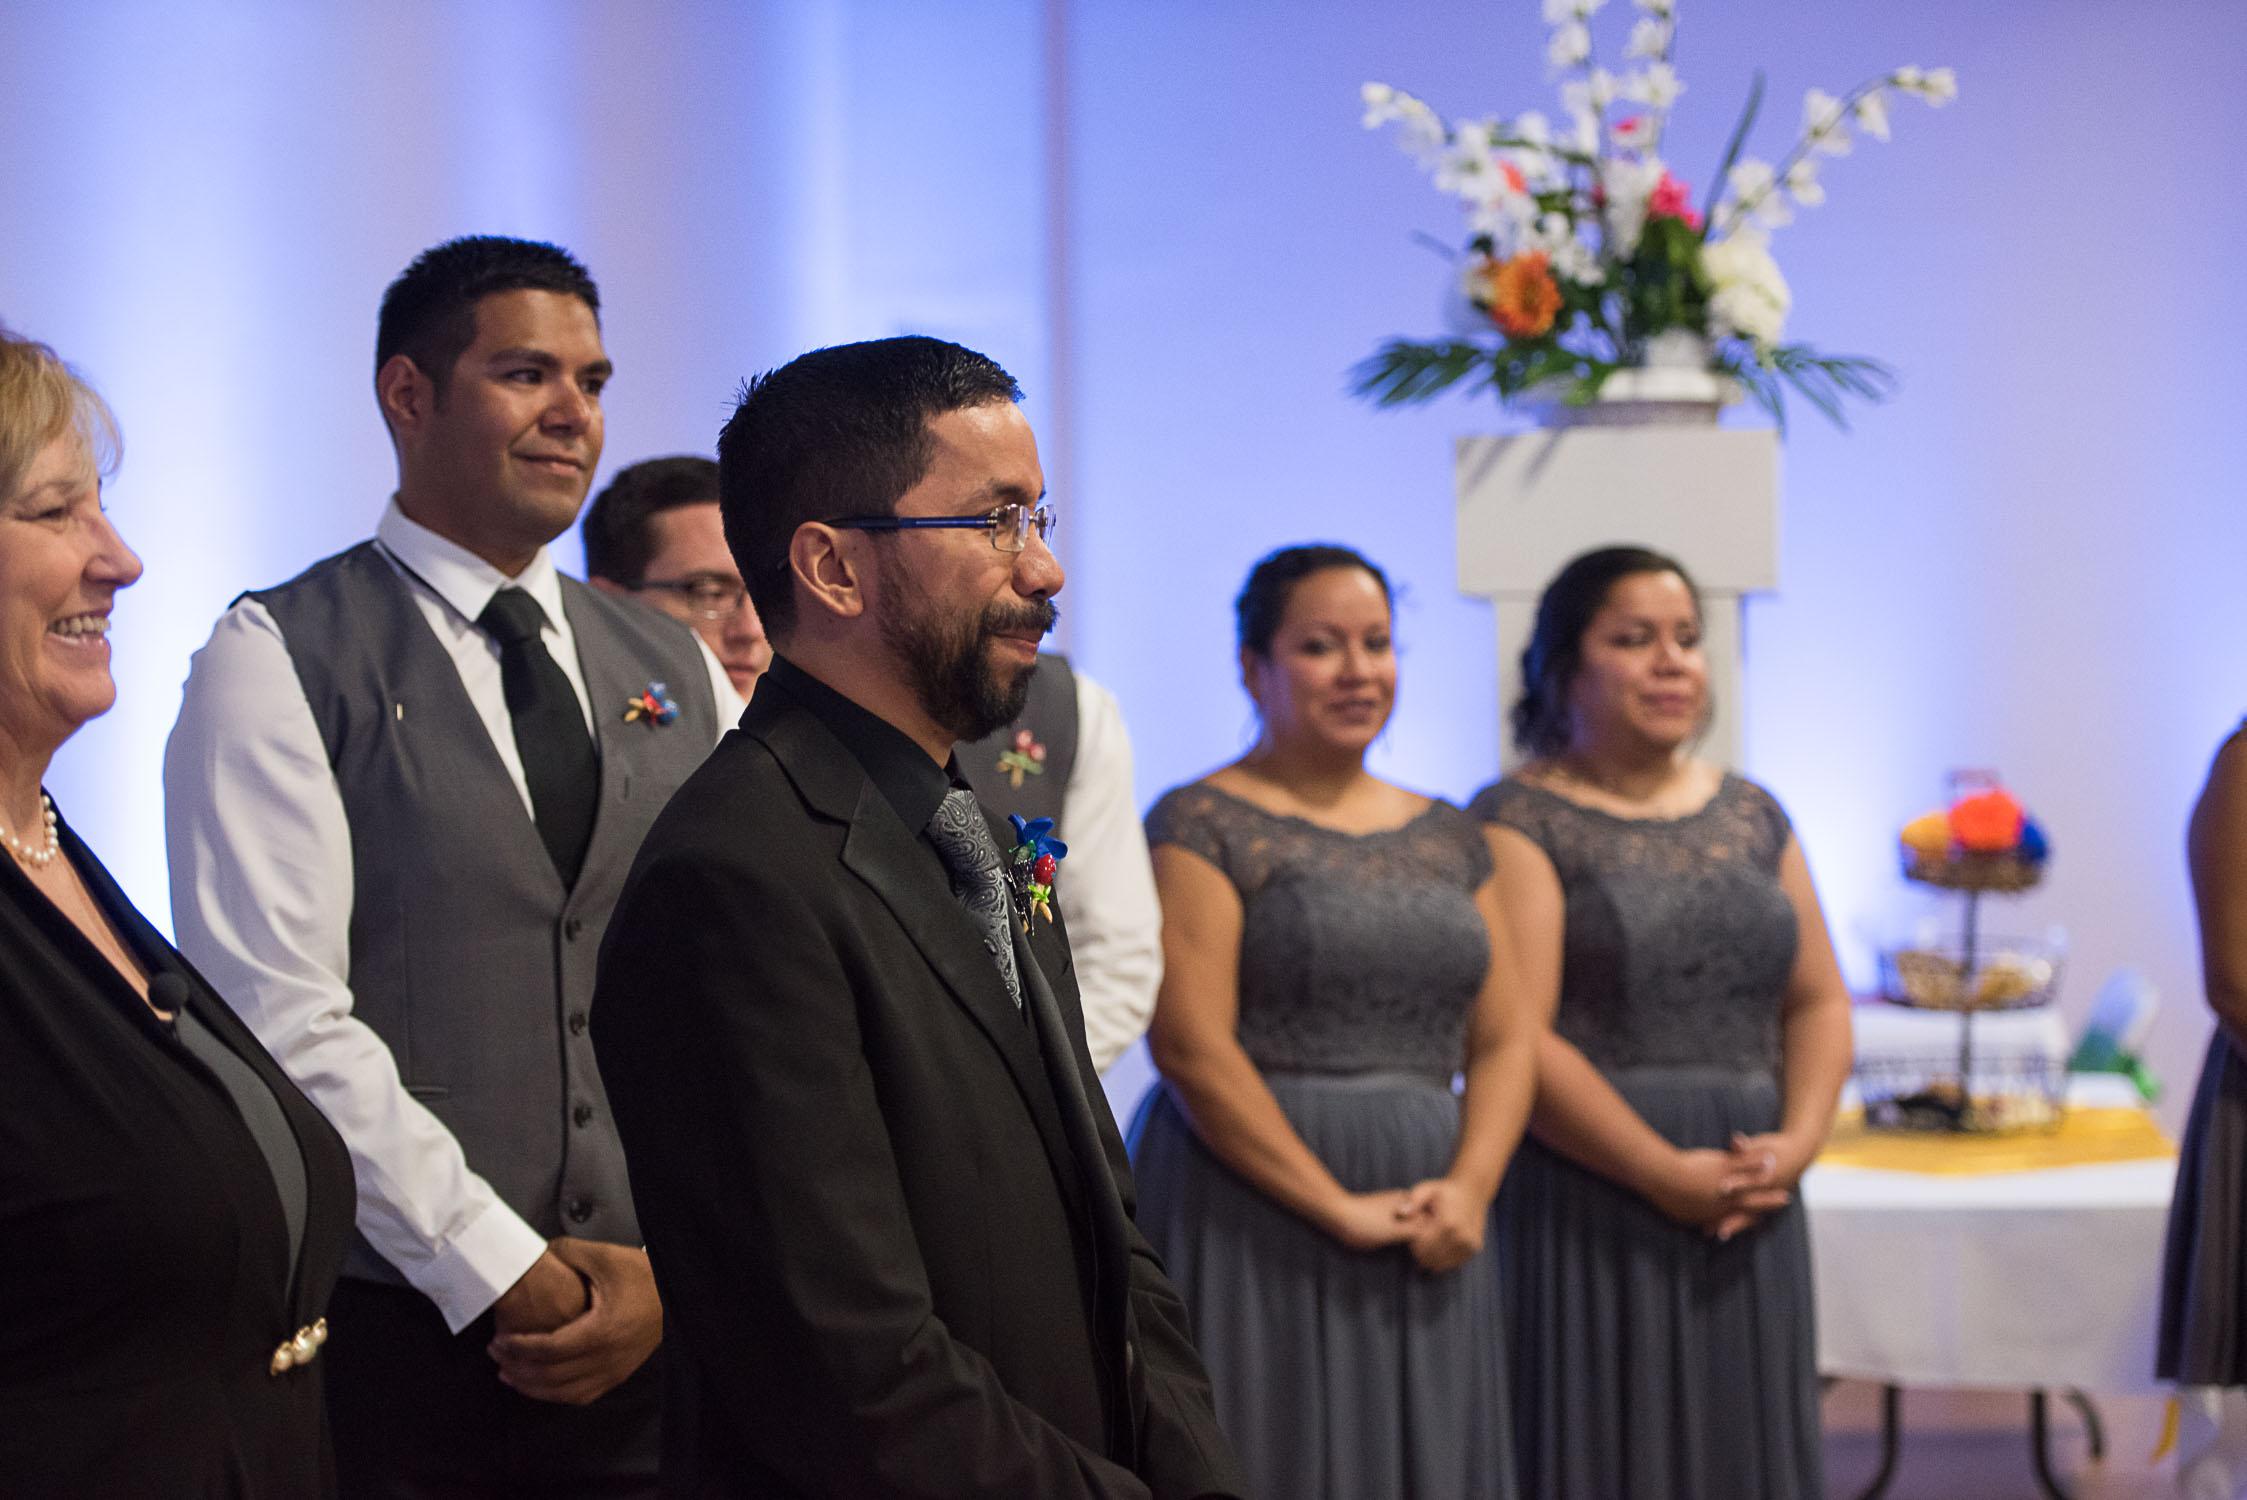 Leal Wedding Mira Visu Photography-106.jpg